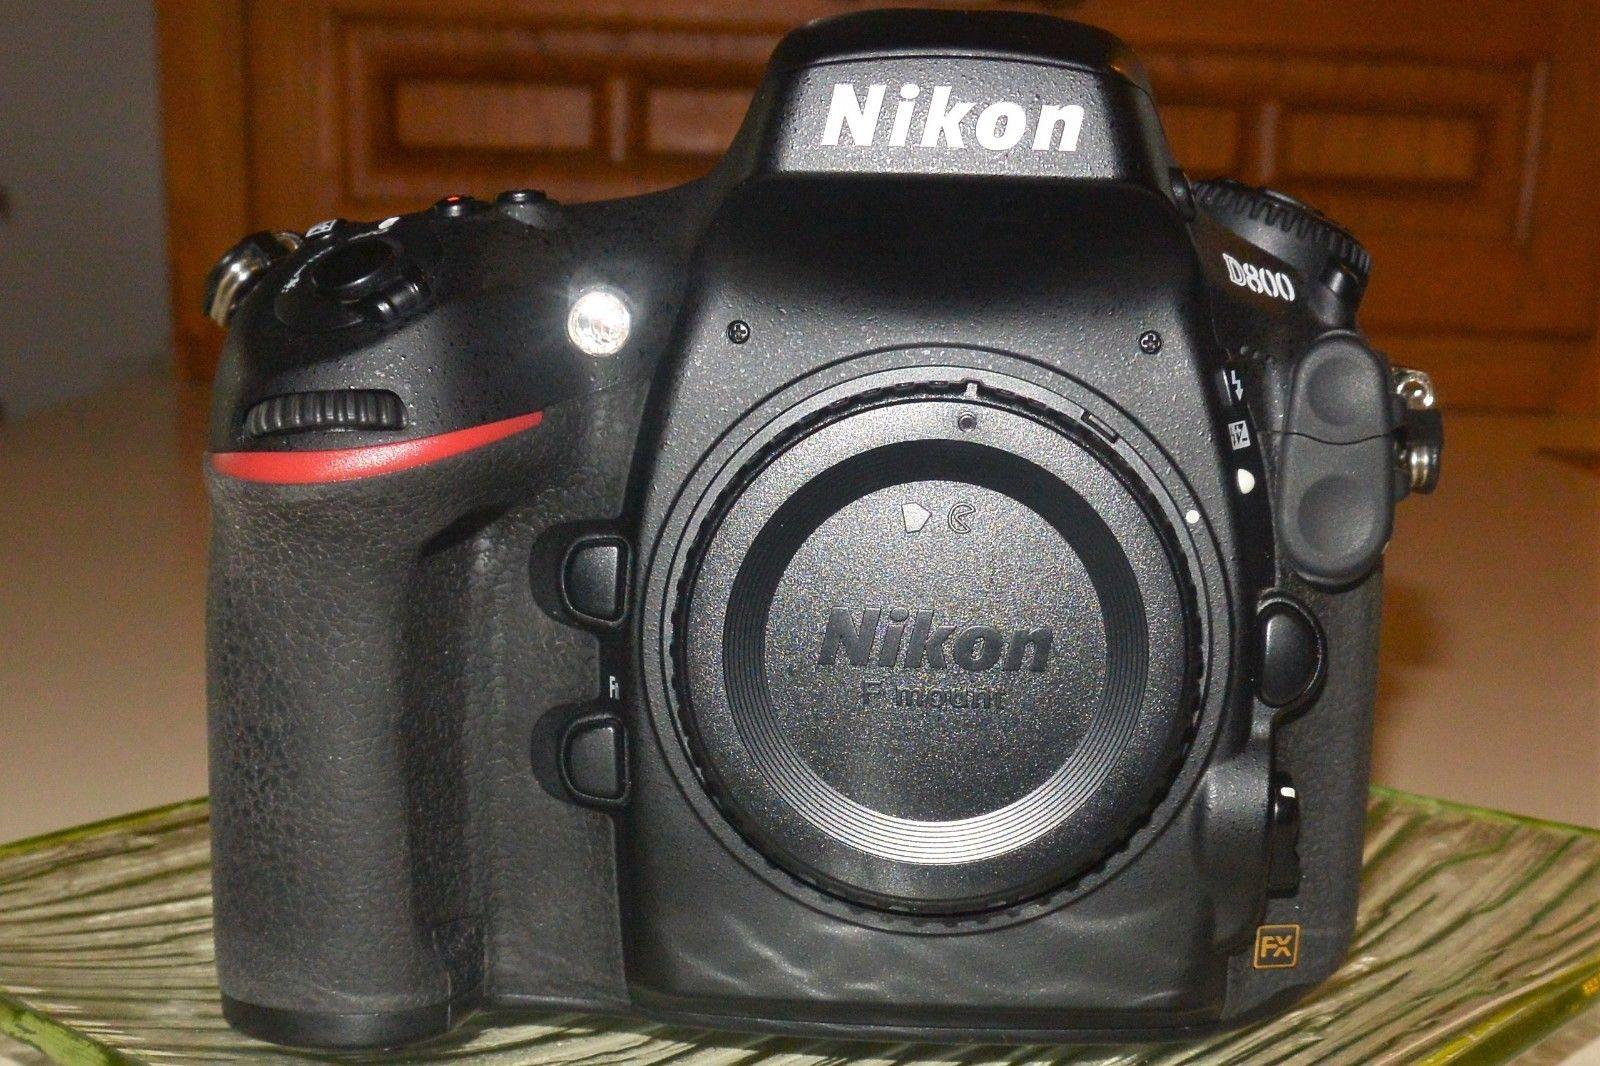 PRISTINE Nikon D800 36.3MP Digital camera FX Format ONLY 9761 clicks